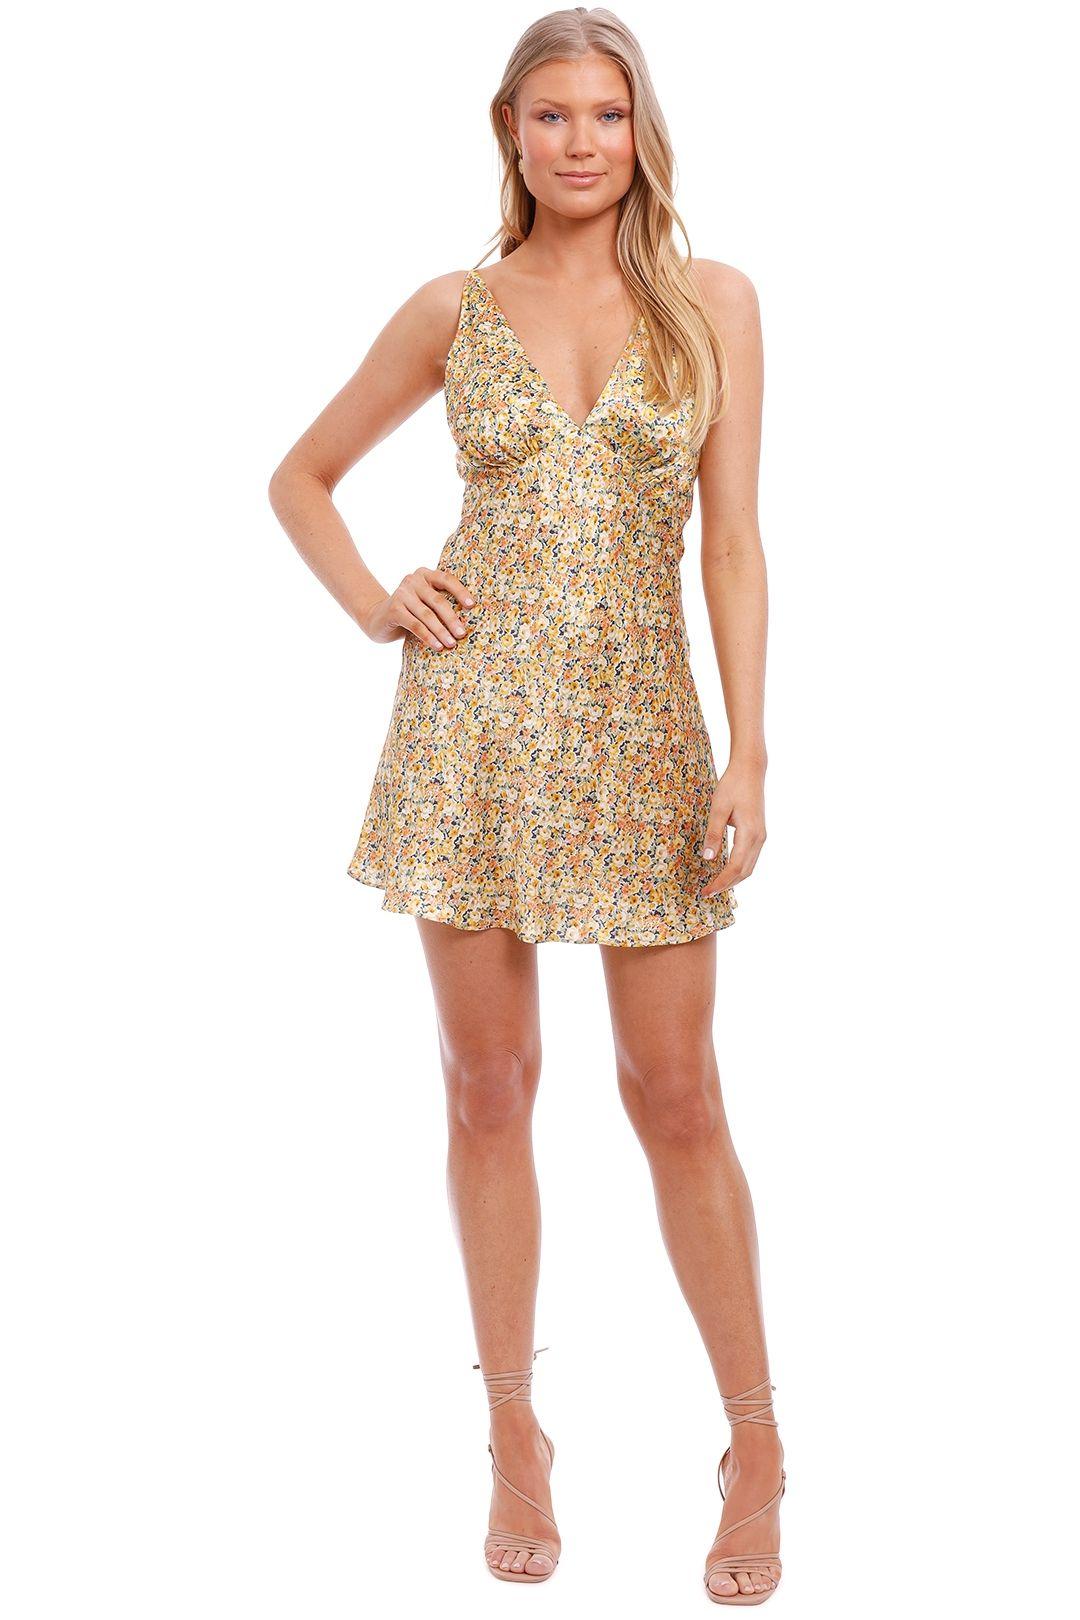 Bec and Bridge Golden Fields Silk Mini Dress slip